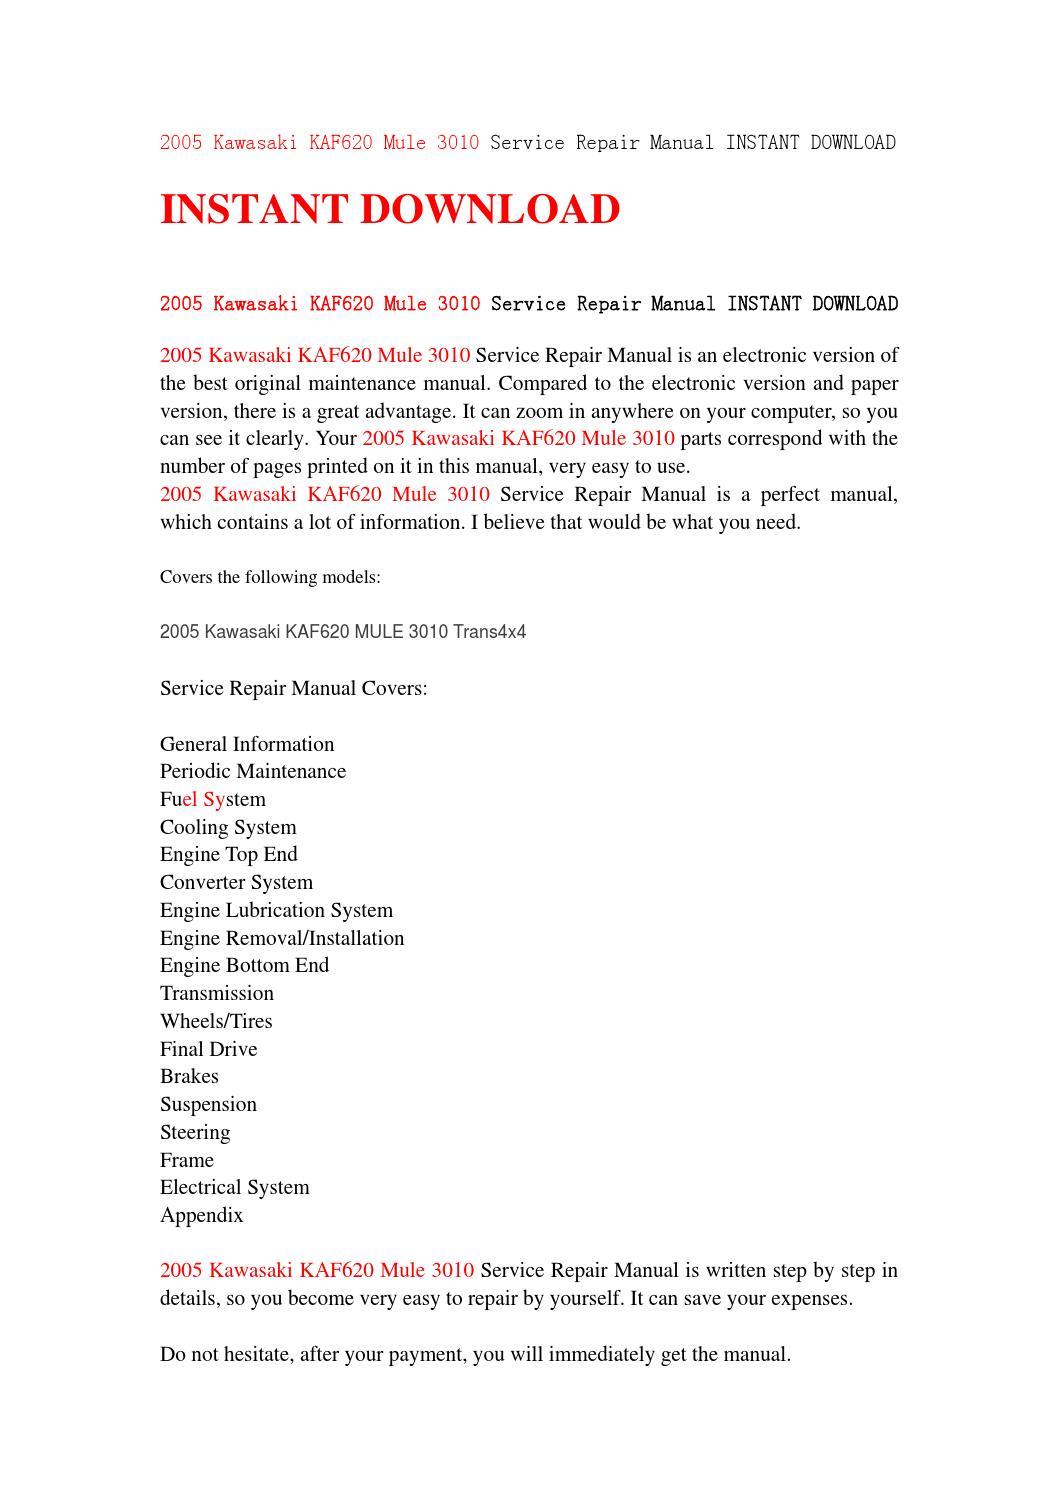 2005 Kawasaki Kaf620 Mule 3010 Service Repair Manual Instant Download By 8hsjfnshen